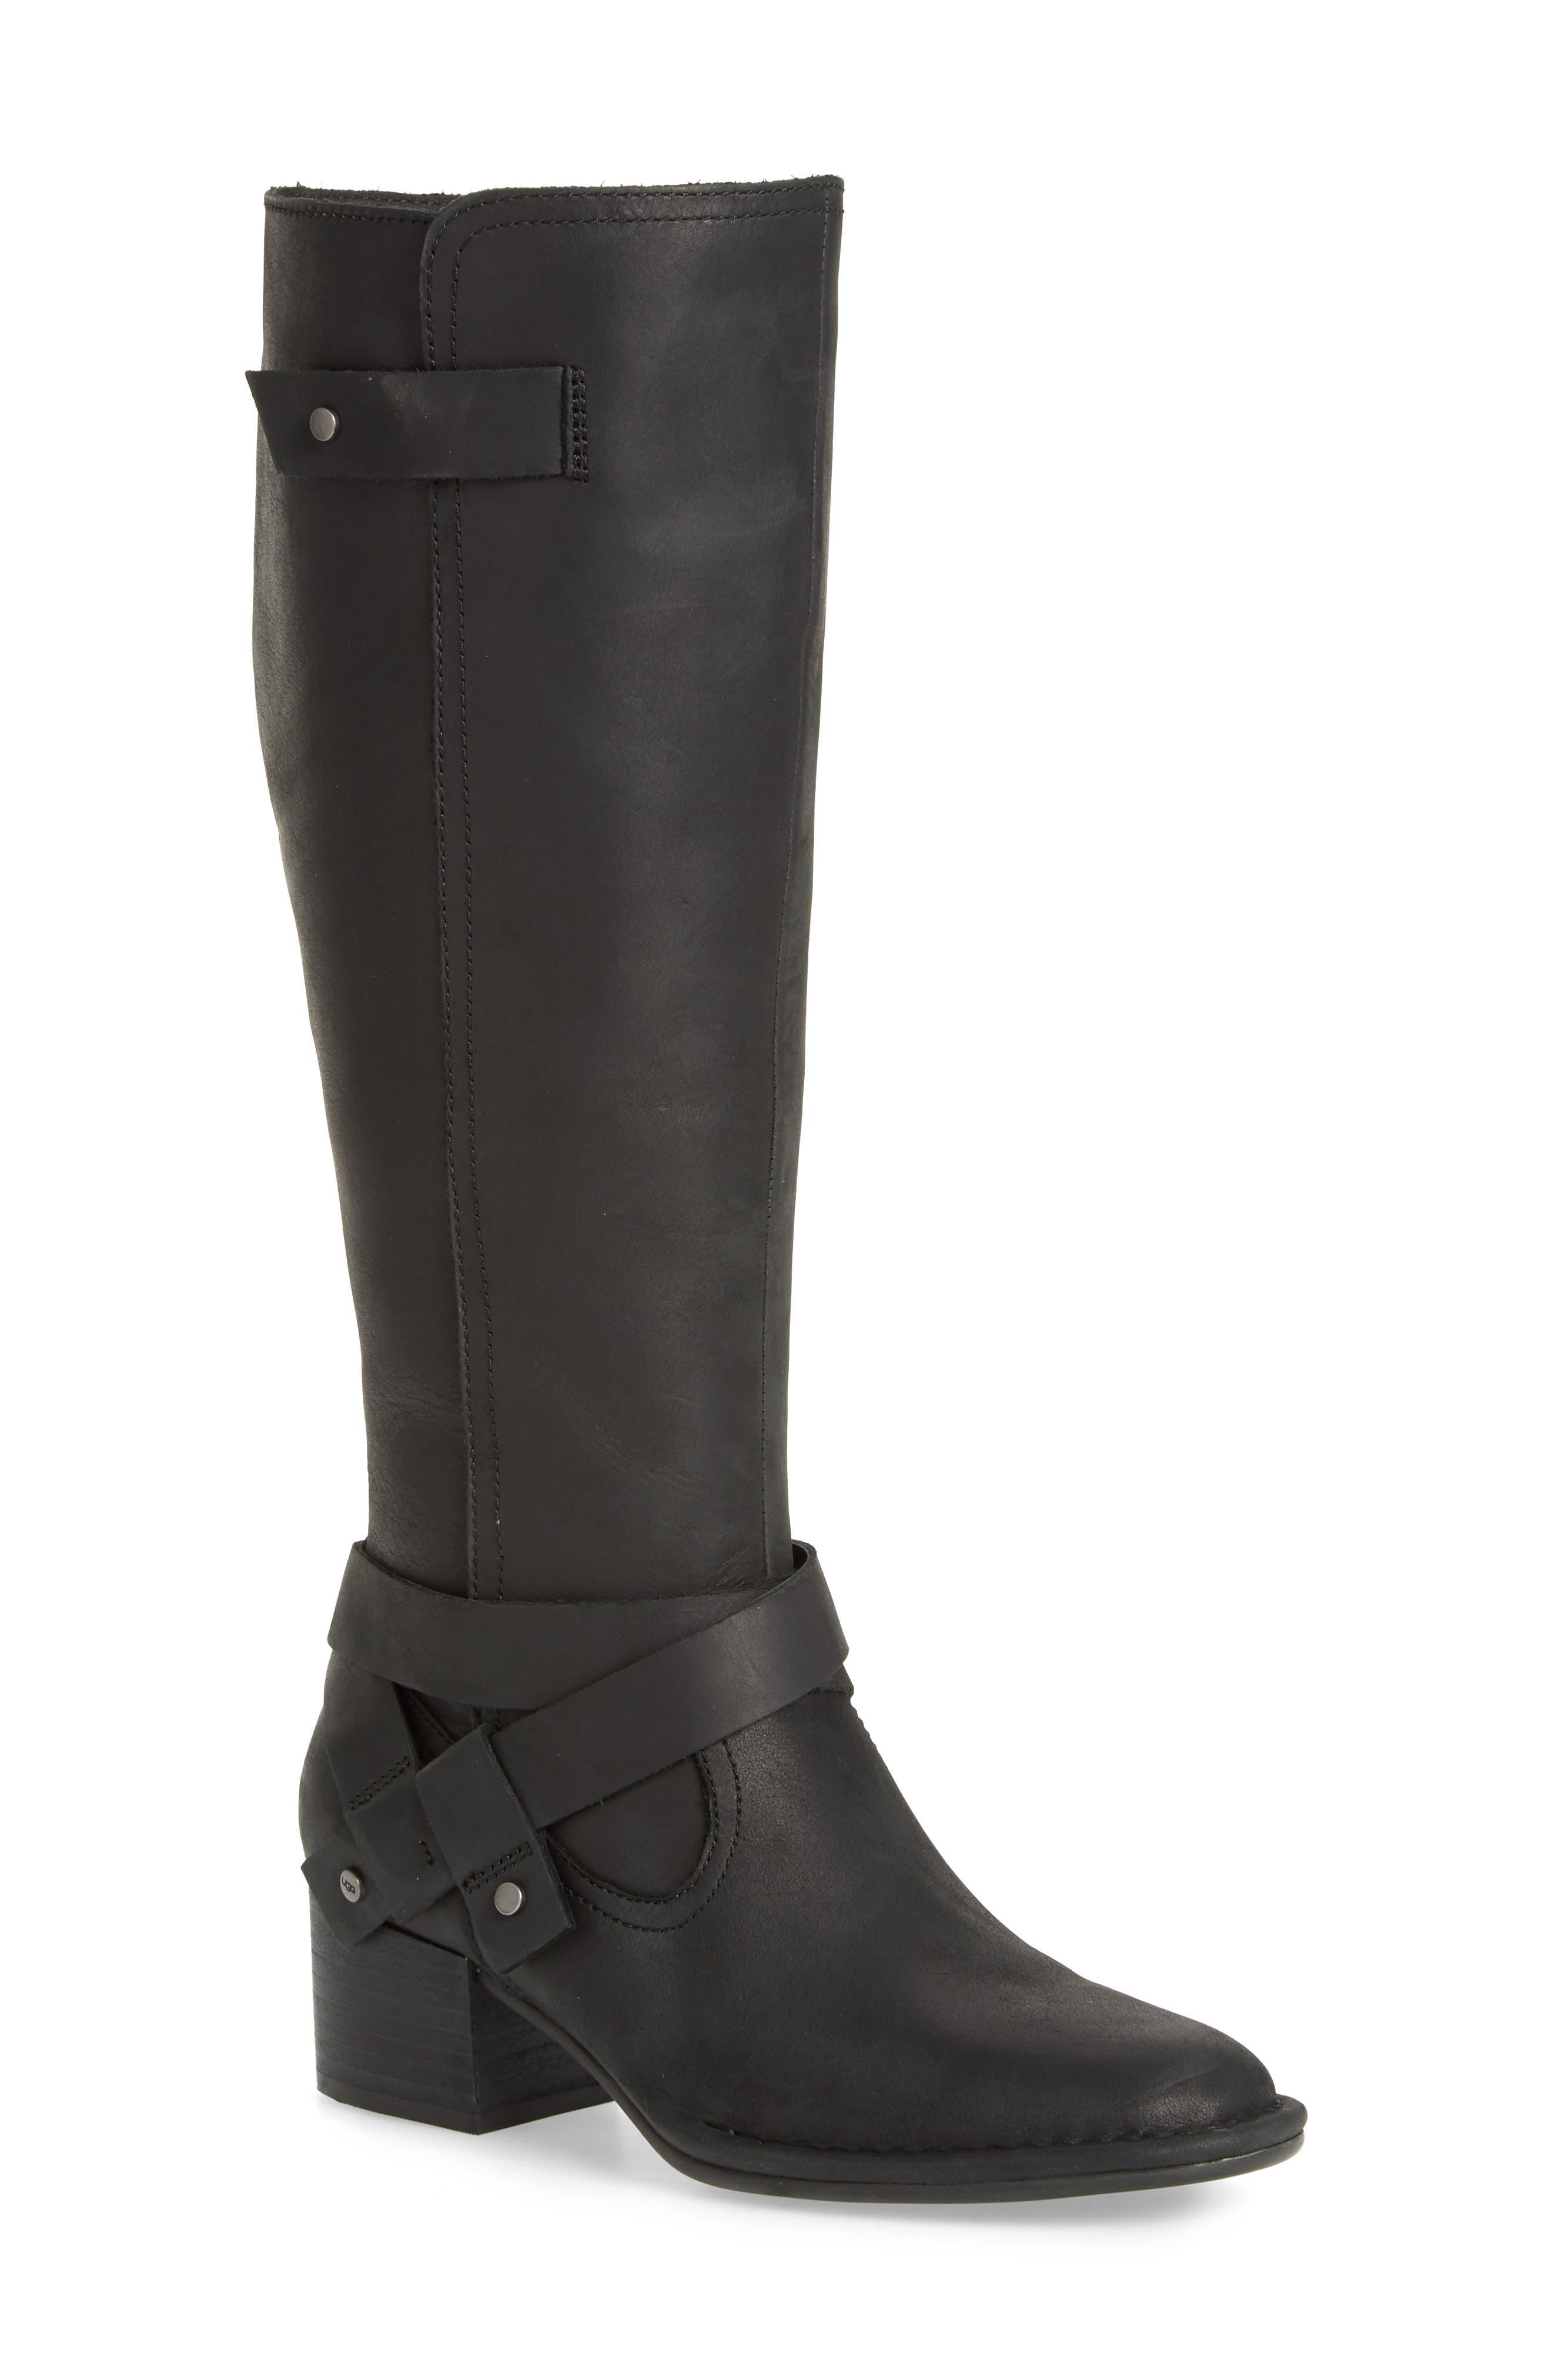 Ugg Bandara Knee High Boot- Black